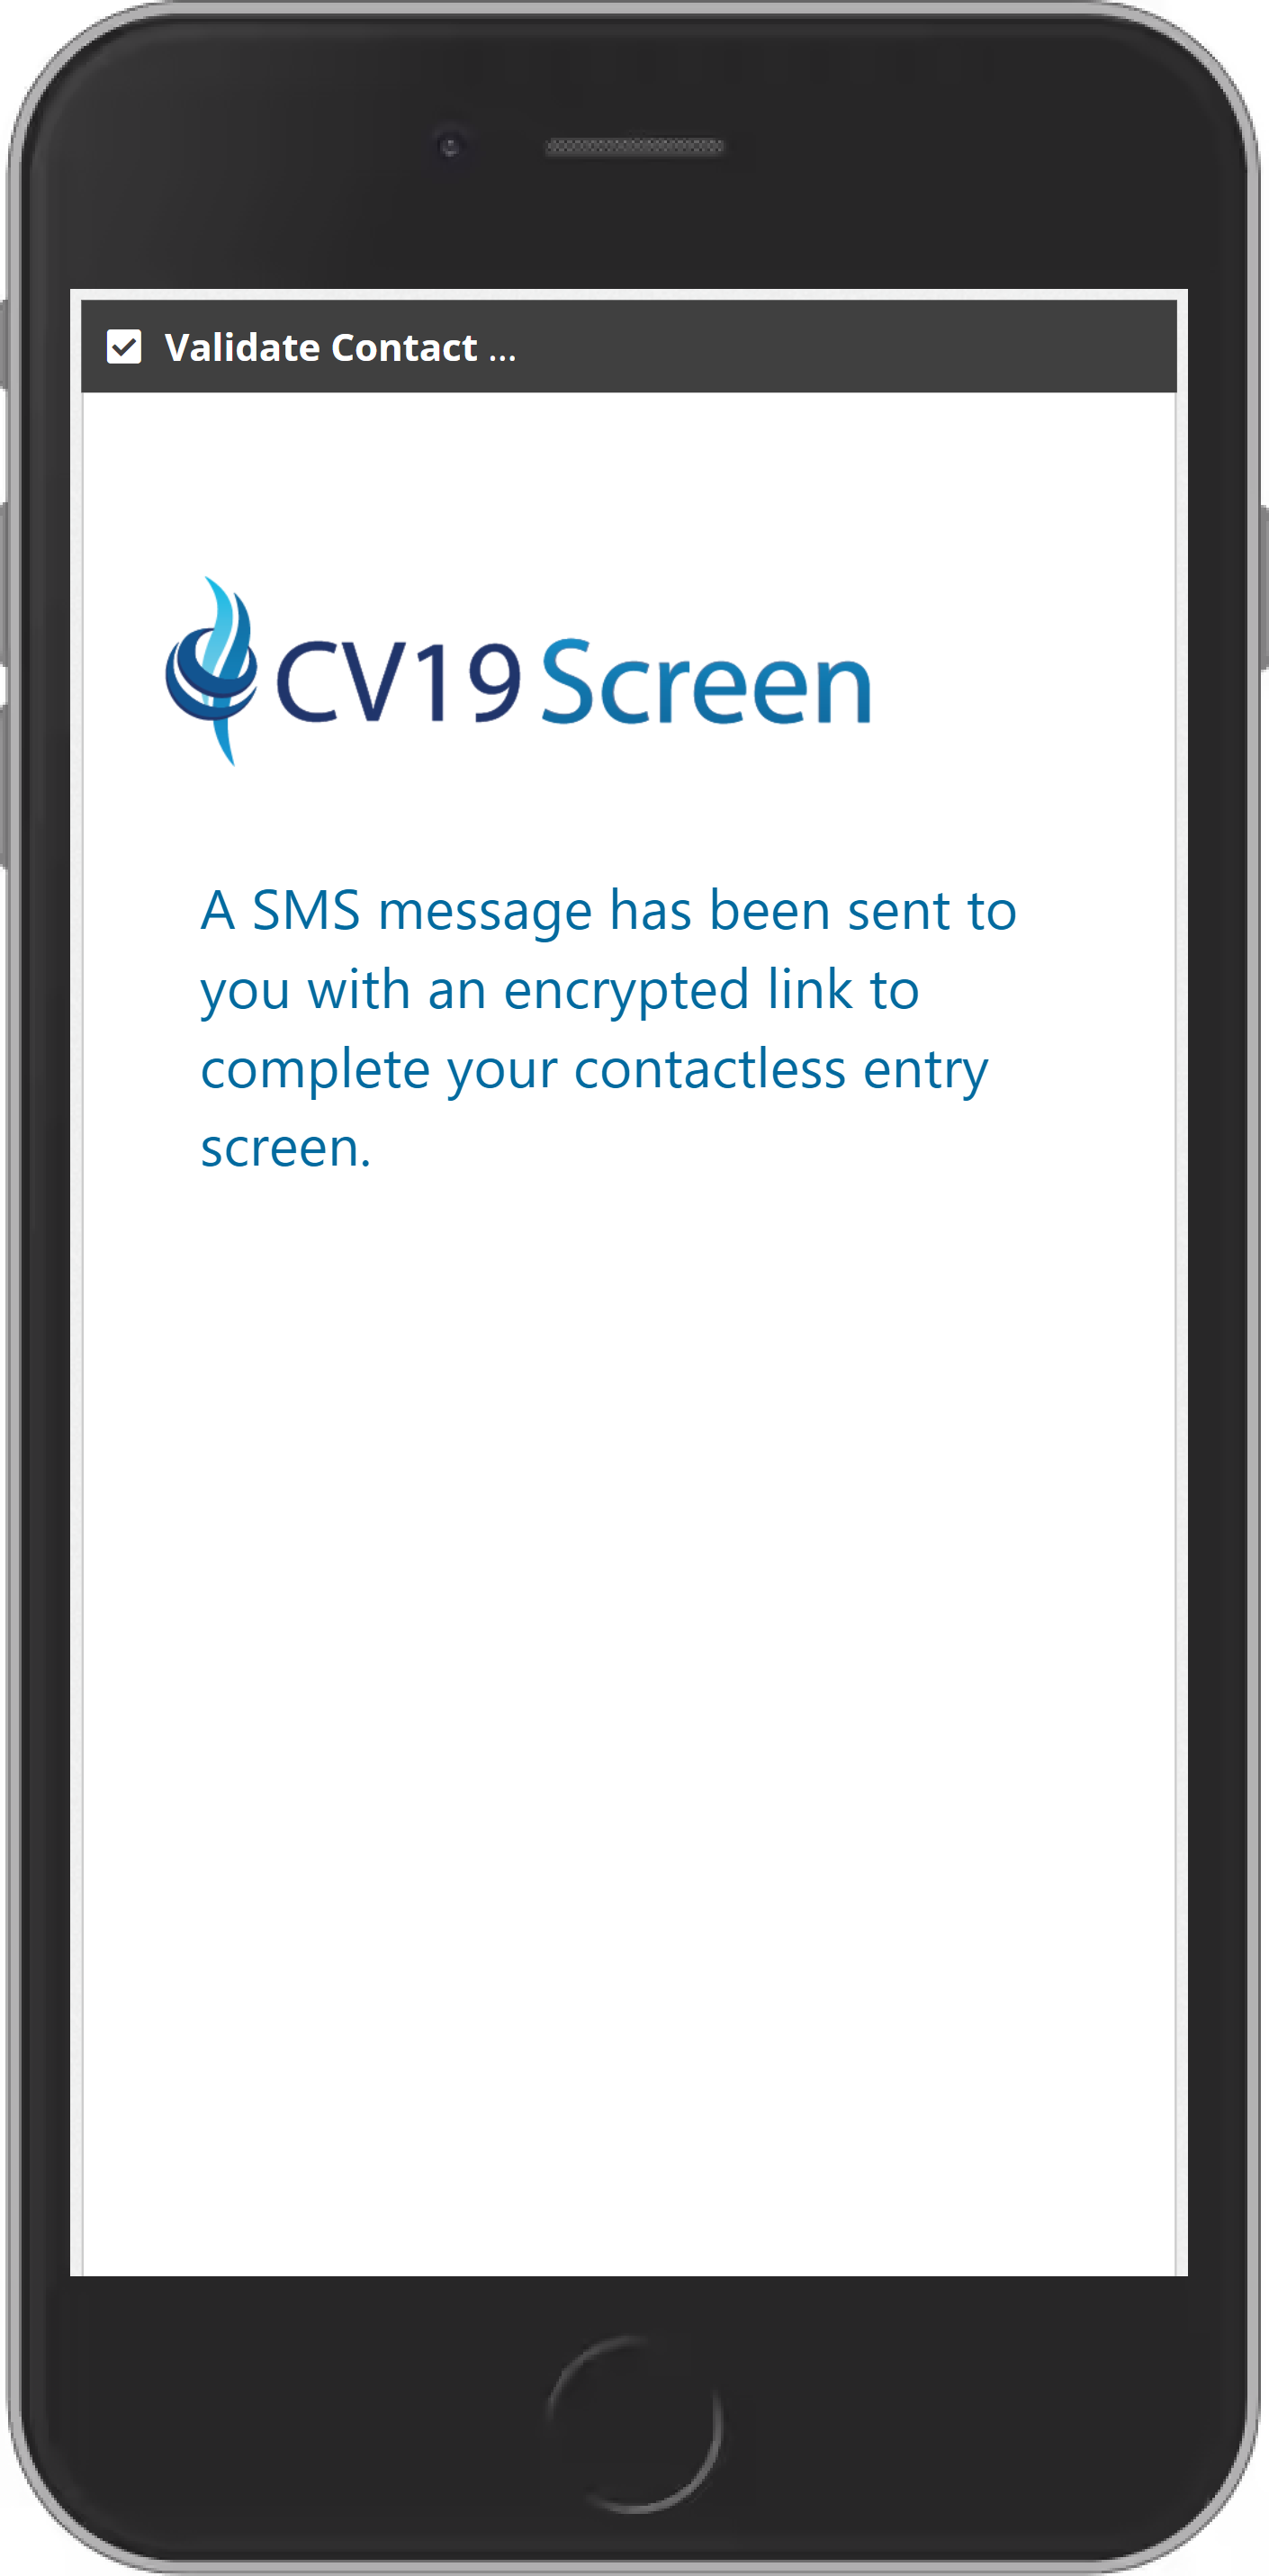 cv19screen_validate